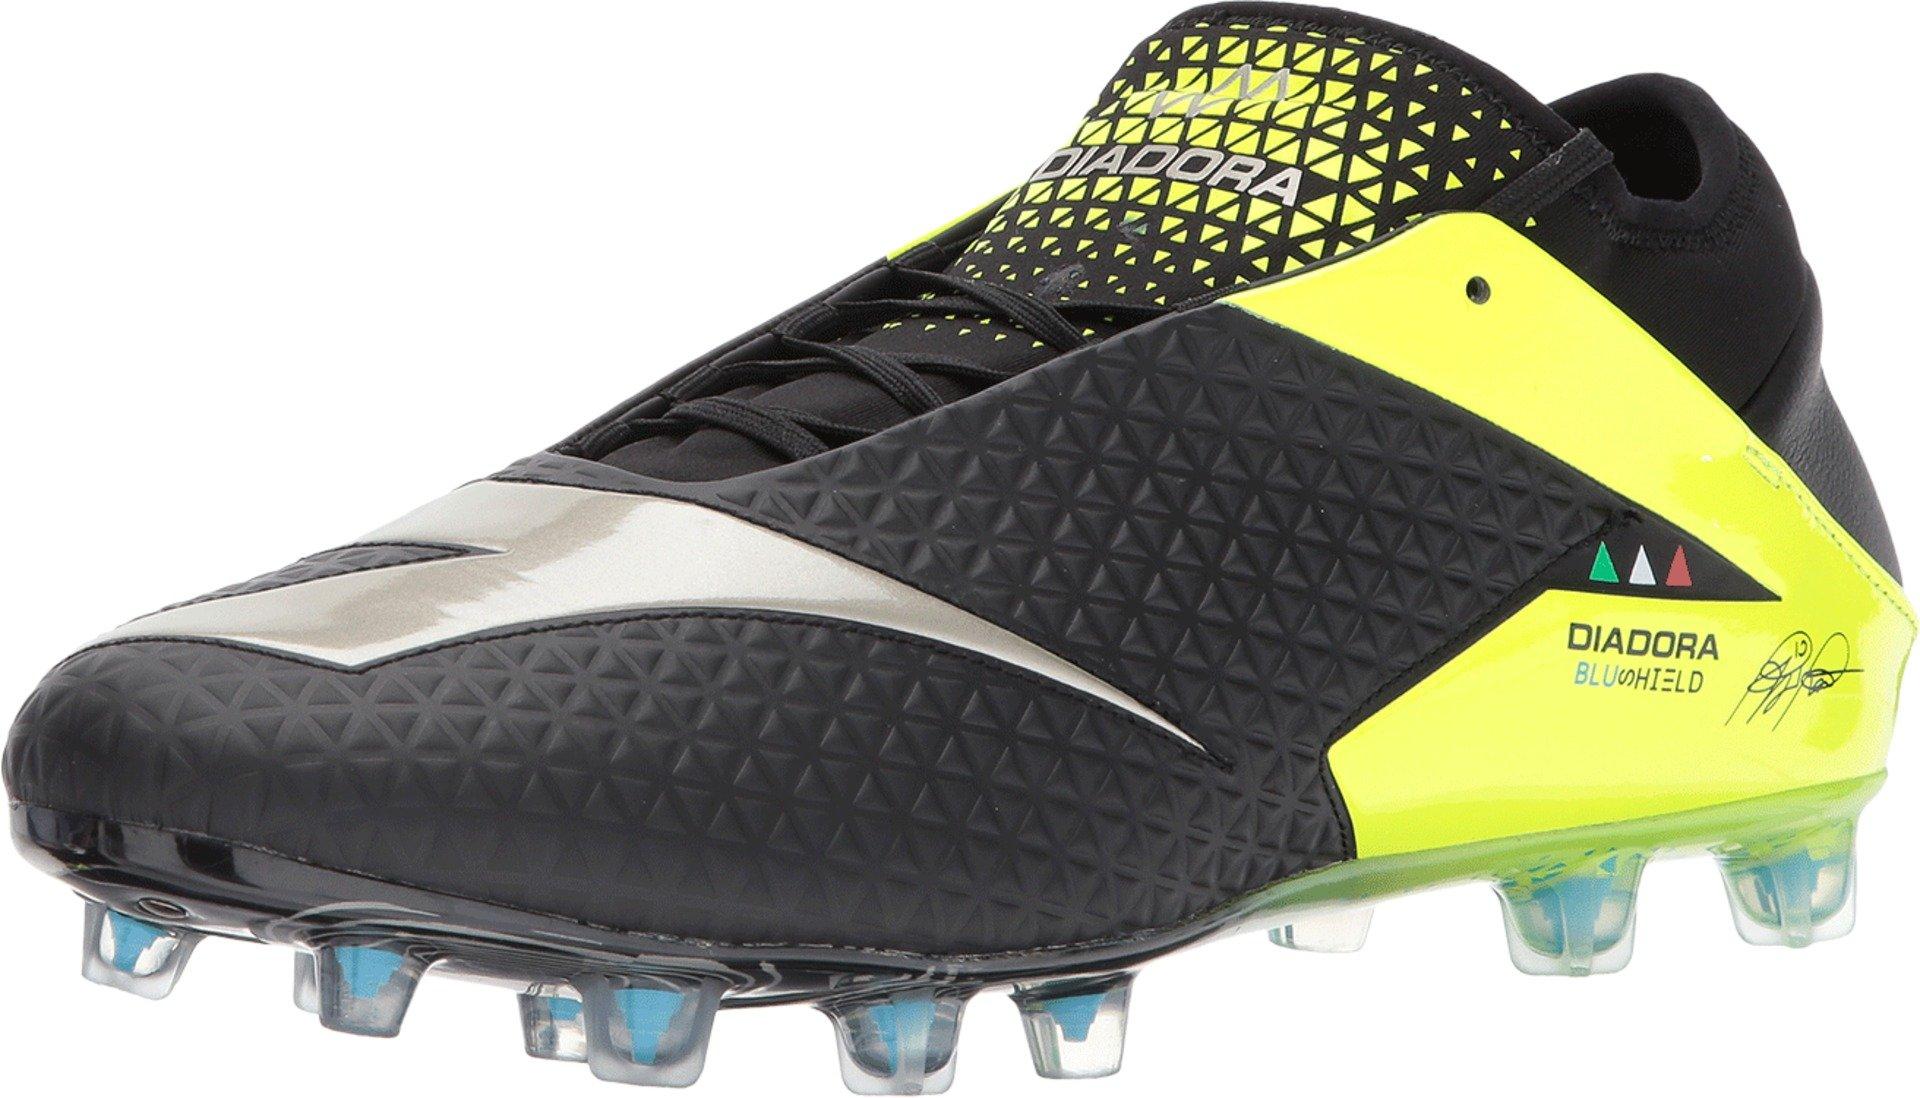 Diadora Men's MW RB Blushield BSH12 Soccer Cleats, Black Kangaroo Leather, 11 M by Diadora